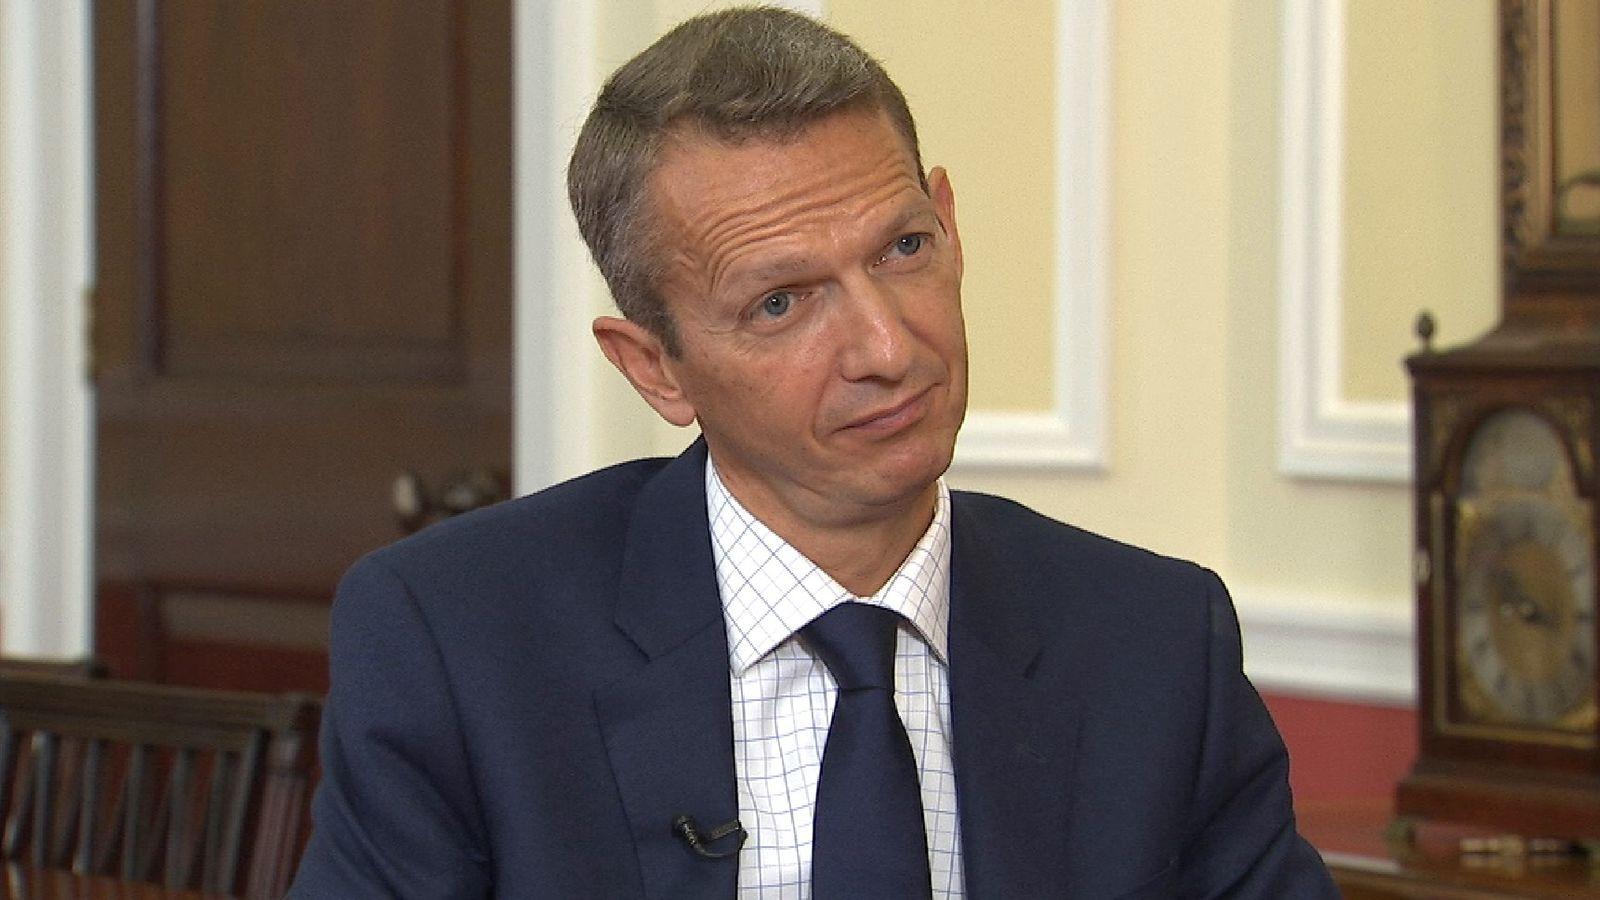 'So far, so V': Bank of England's Haldane sees sharp bounce-back | Business News